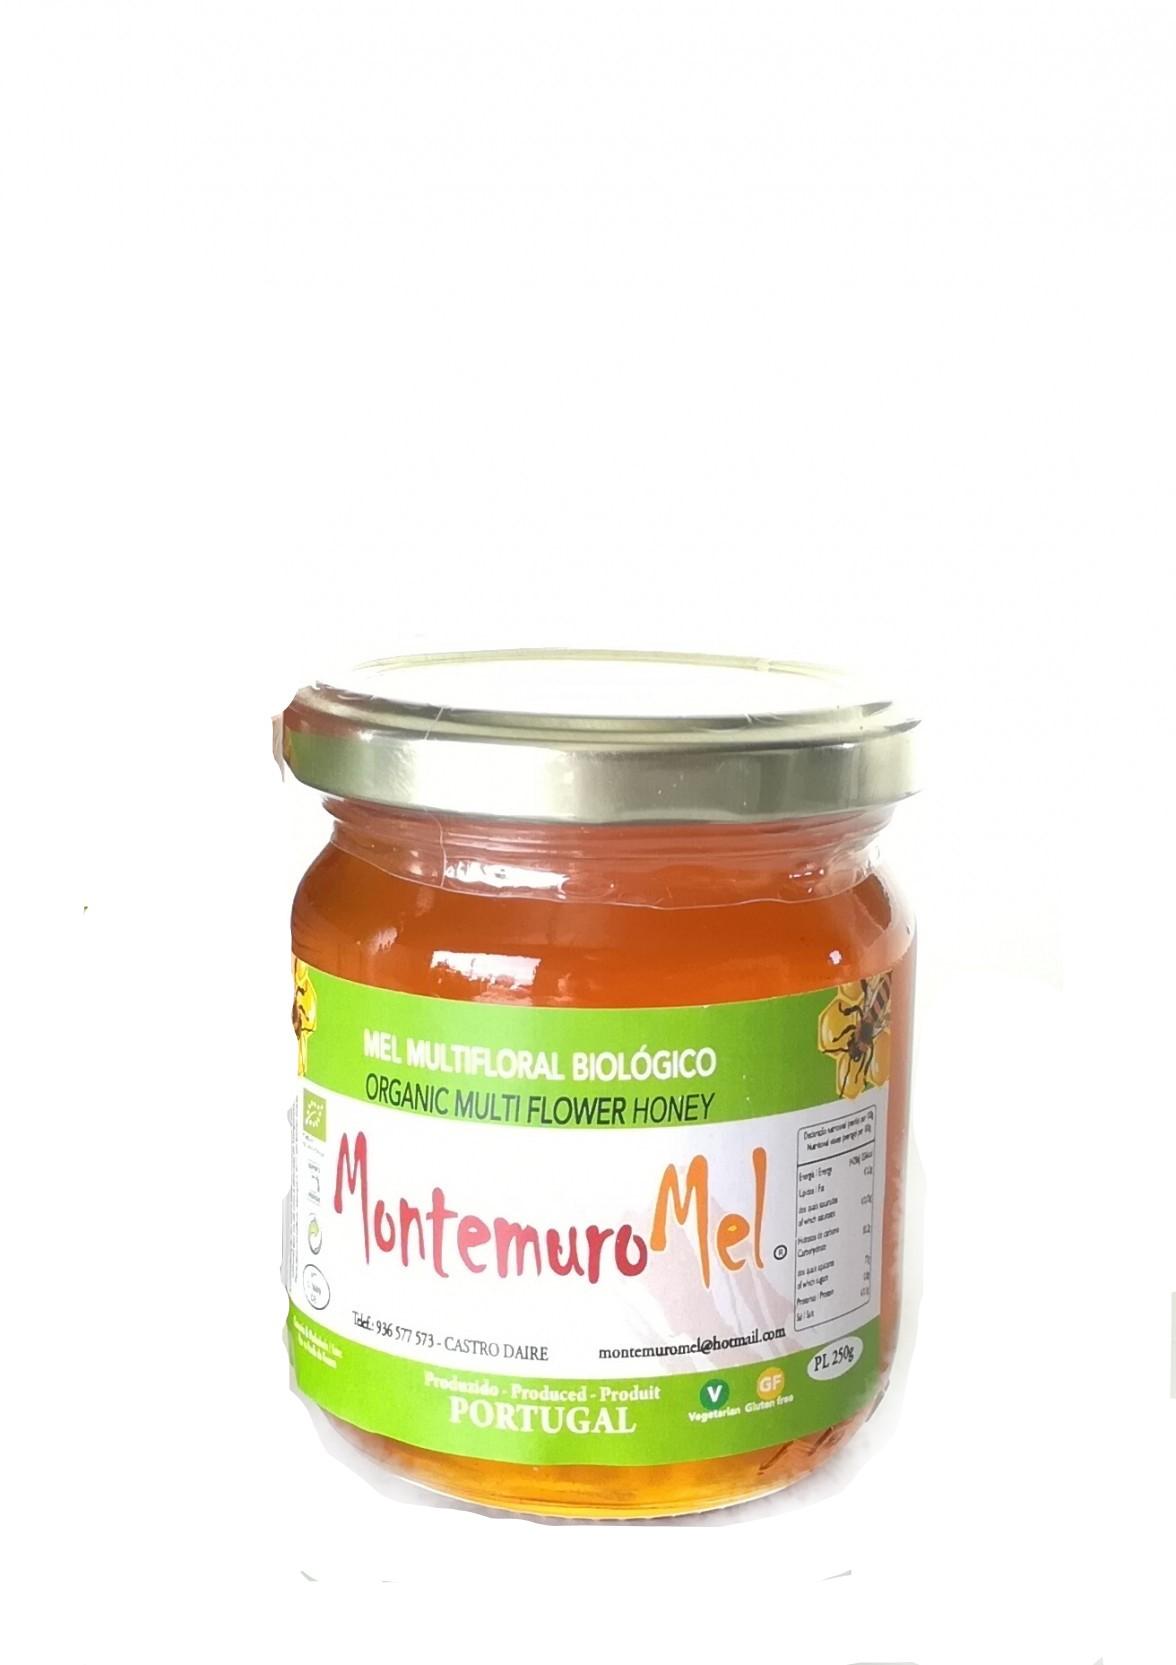 Mel Multifloral BIO - Serra do Montemuro 250g